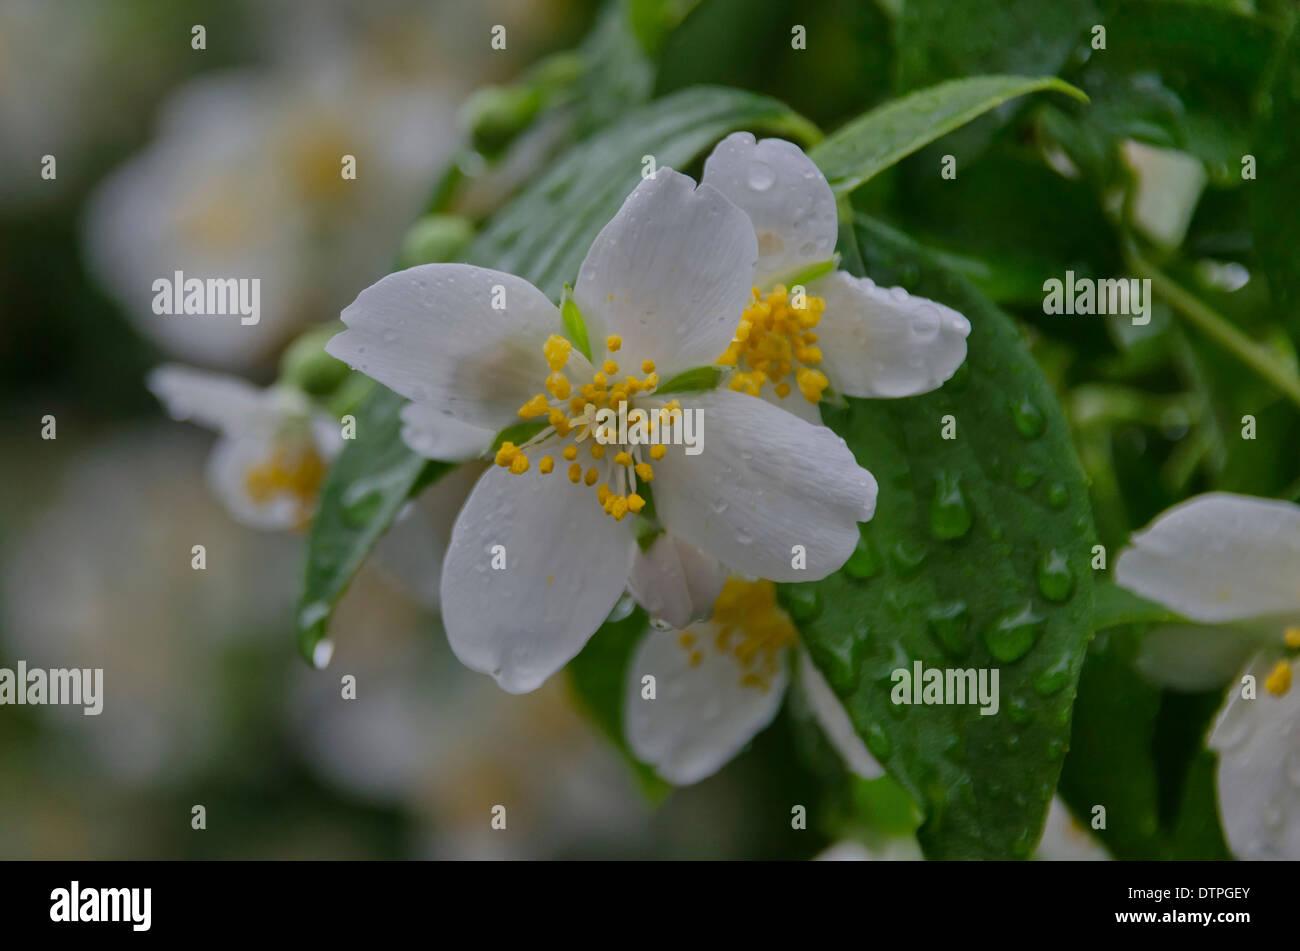 Jasmine white flowers stock photo 66878755 alamy jasmine white flowers izmirmasajfo